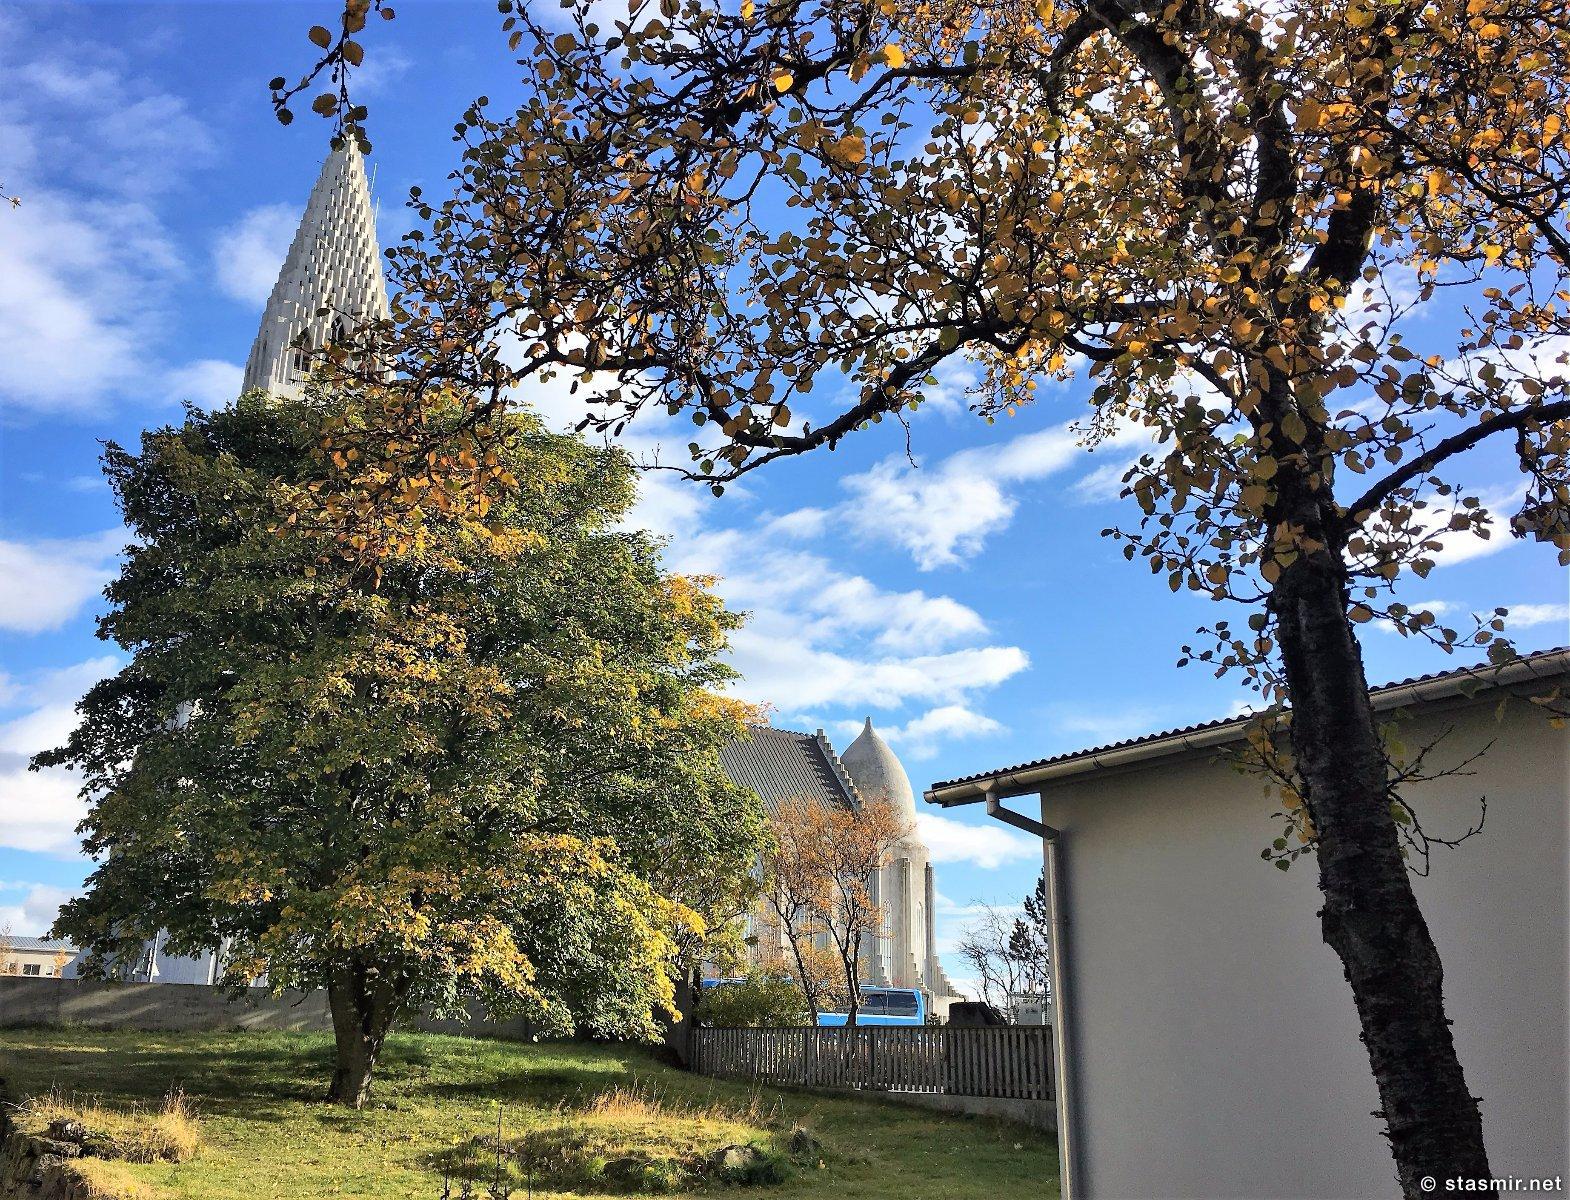 Хадльгримскиркья осенью, Рейкьявик, фото Стасмир, Photo Stasmir